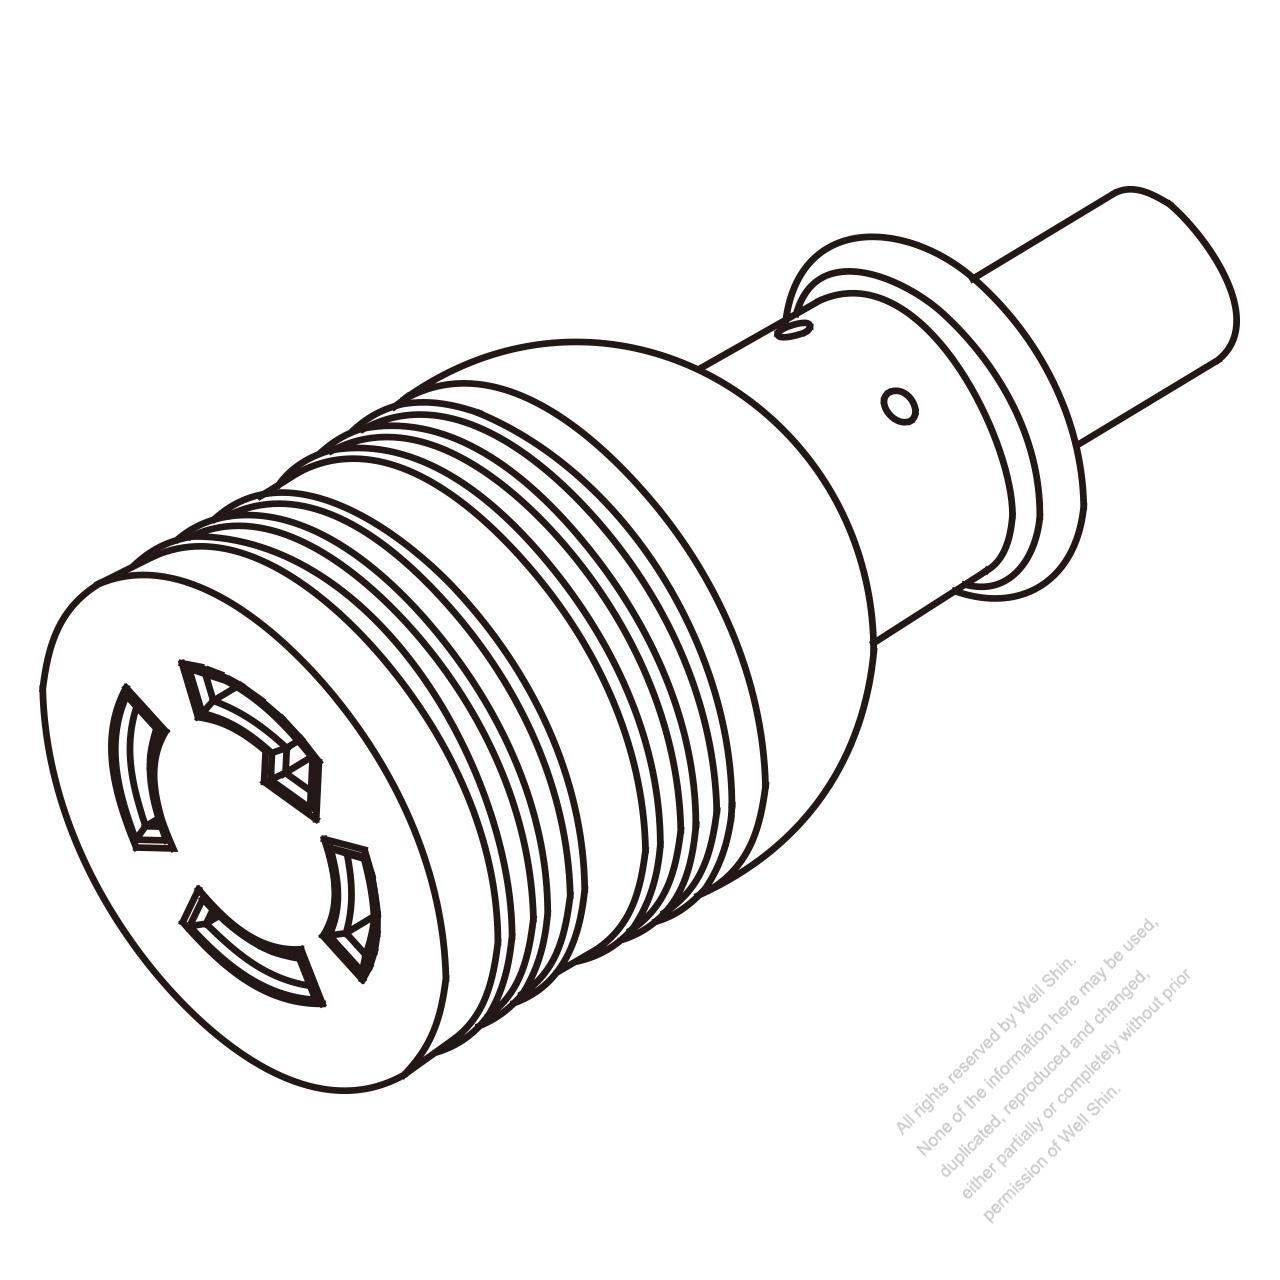 l14 30 wiring diagram facbooik com L6 20 Wiring Diagram l14 30 wiring diagram 125v on l14 images l6 20 wiring diagram